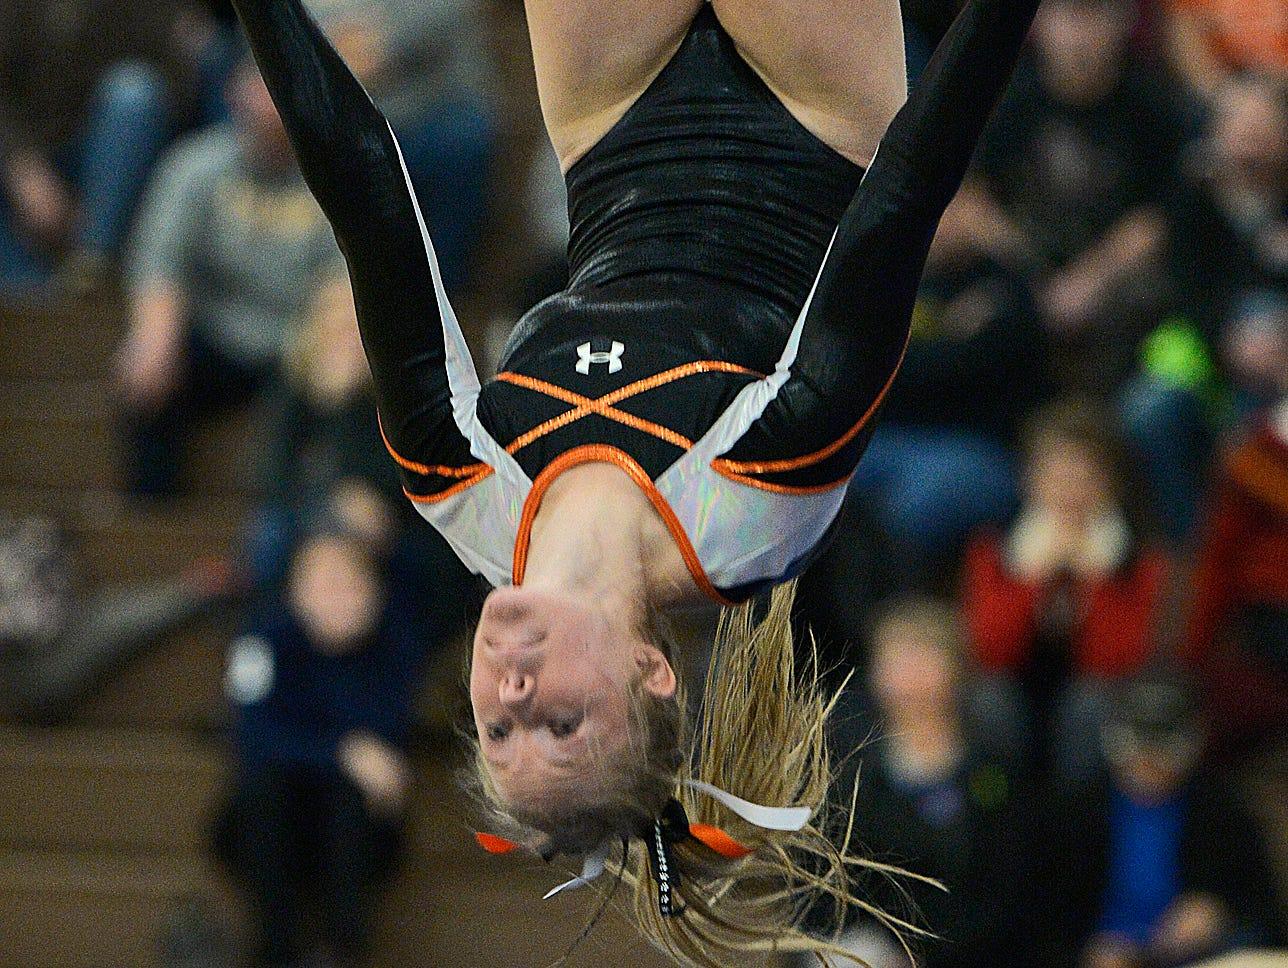 St. Cloud Tech senior gymnast Kalley Thompson dismounts after her balance beam routine Saturday, Dec. 5 during the St. Cloud Apollo Gymnastics Invite.